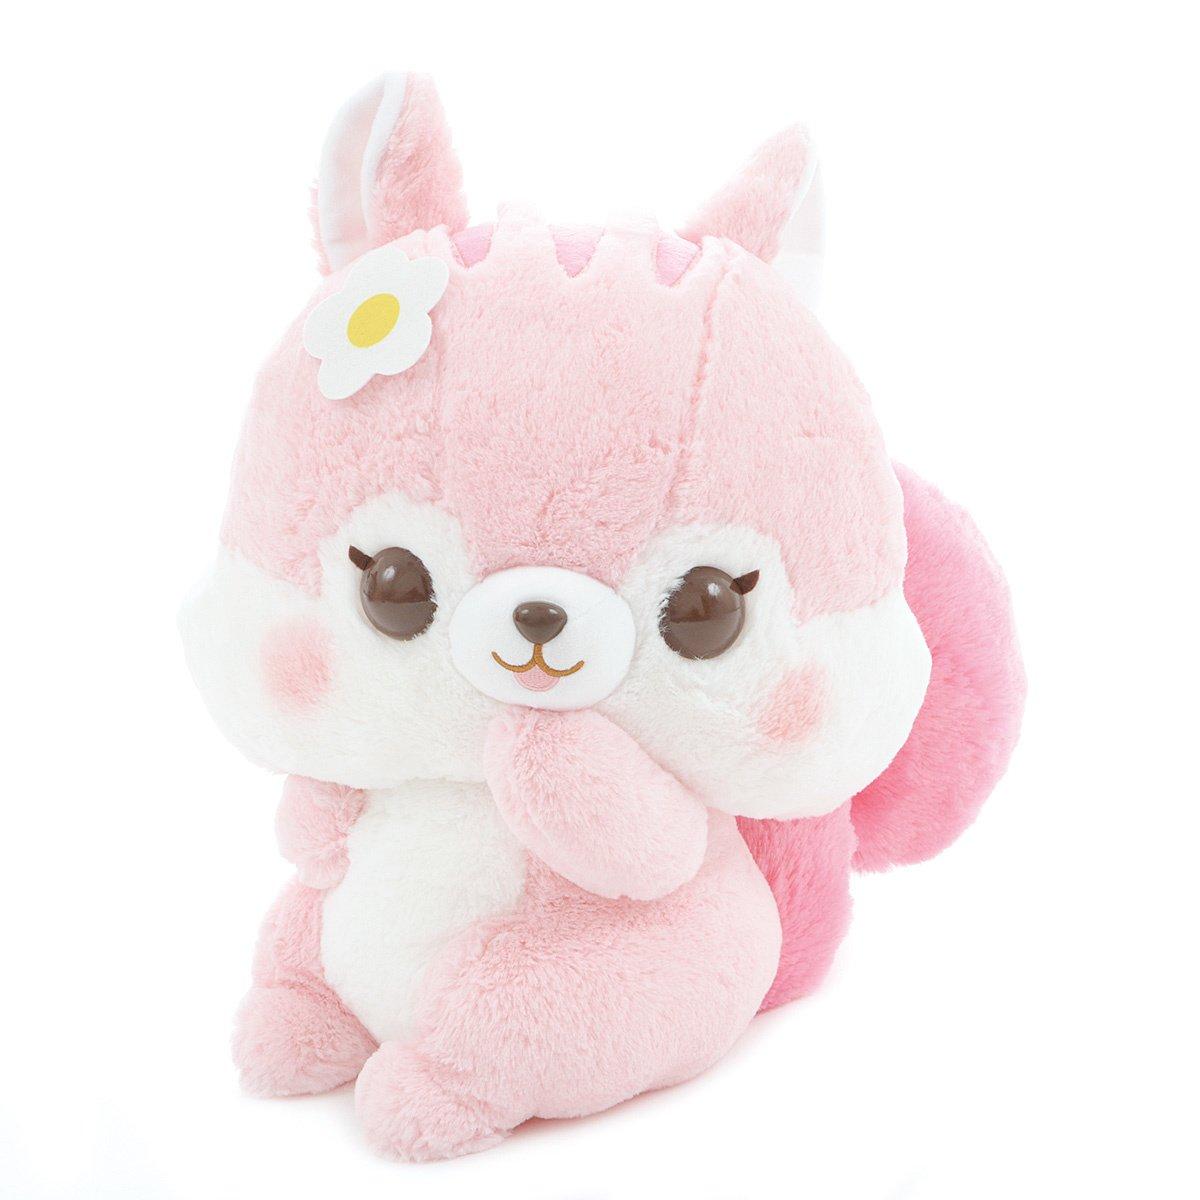 Plush Squirrel, Amuse, Fusappo Nuts Chipmunk, Cheek, Pink, 16 Inches BIG Size